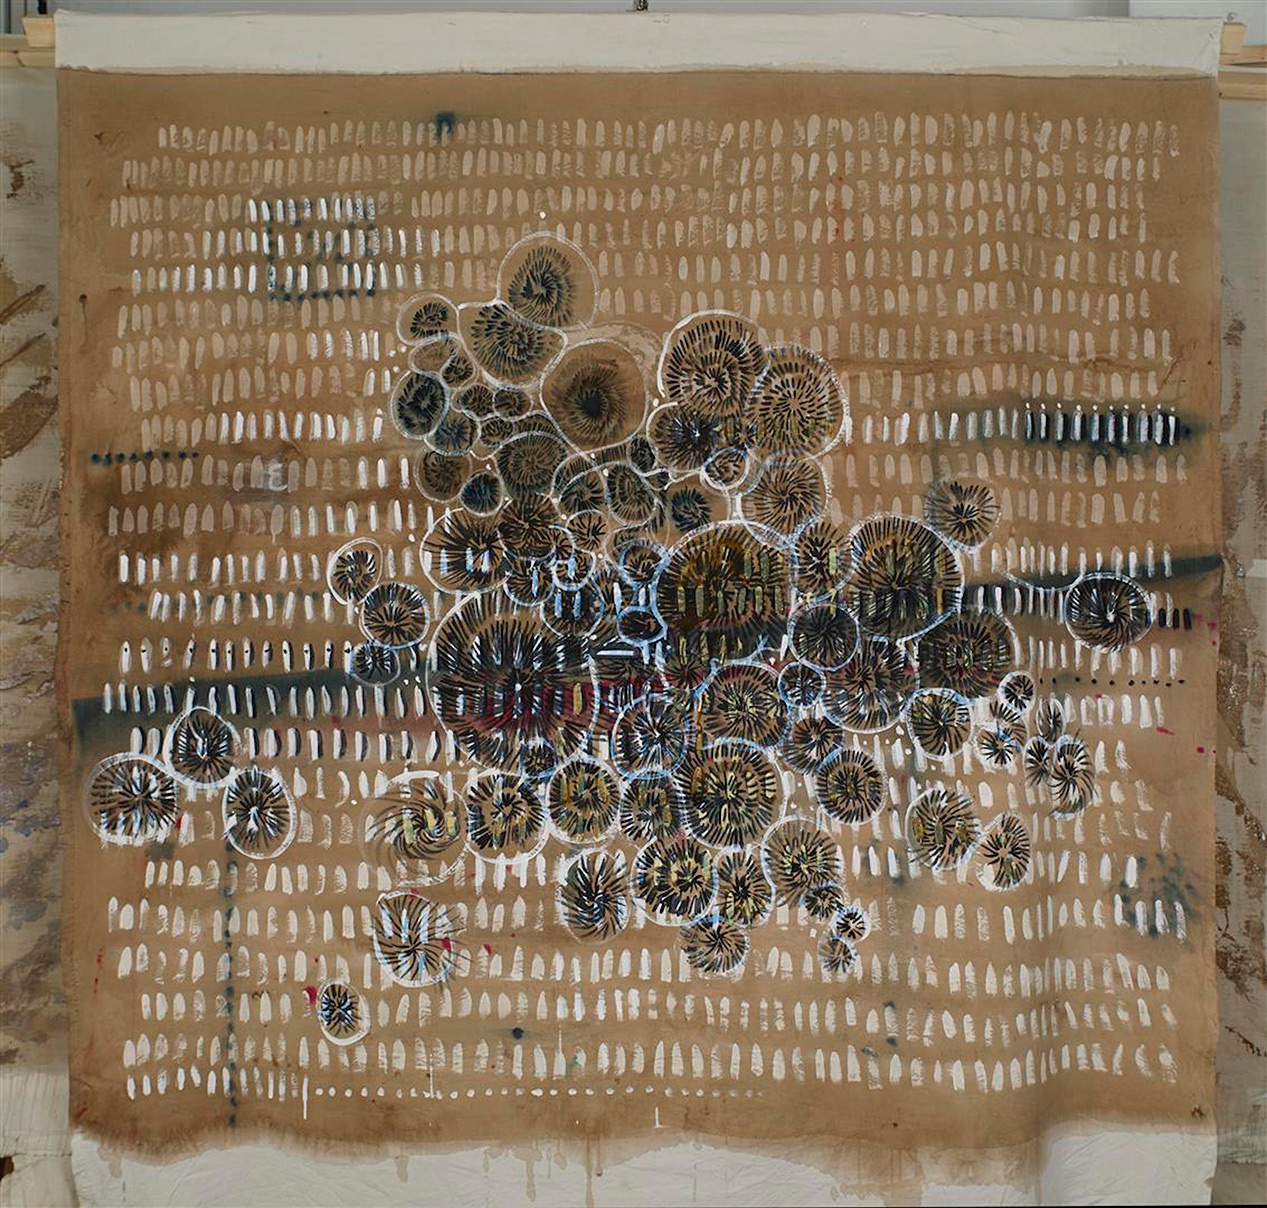 Eleni Zouni, Epistula VI, 2018, Ink on canvas, 165X177 cm